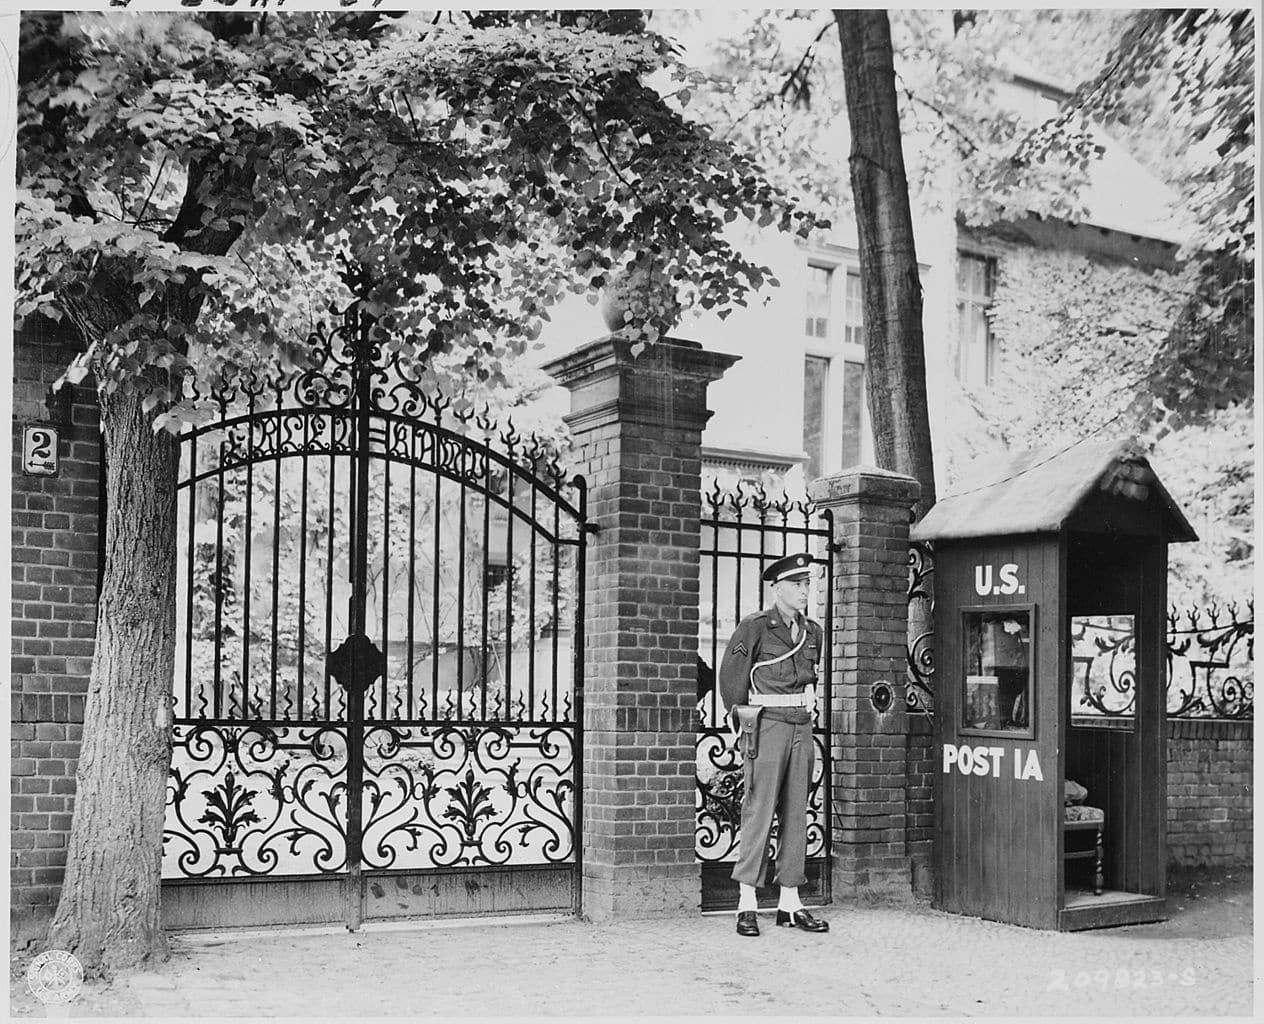 Potsdam Conference - July 19th 1945 - The Entrance To Truman's Villa